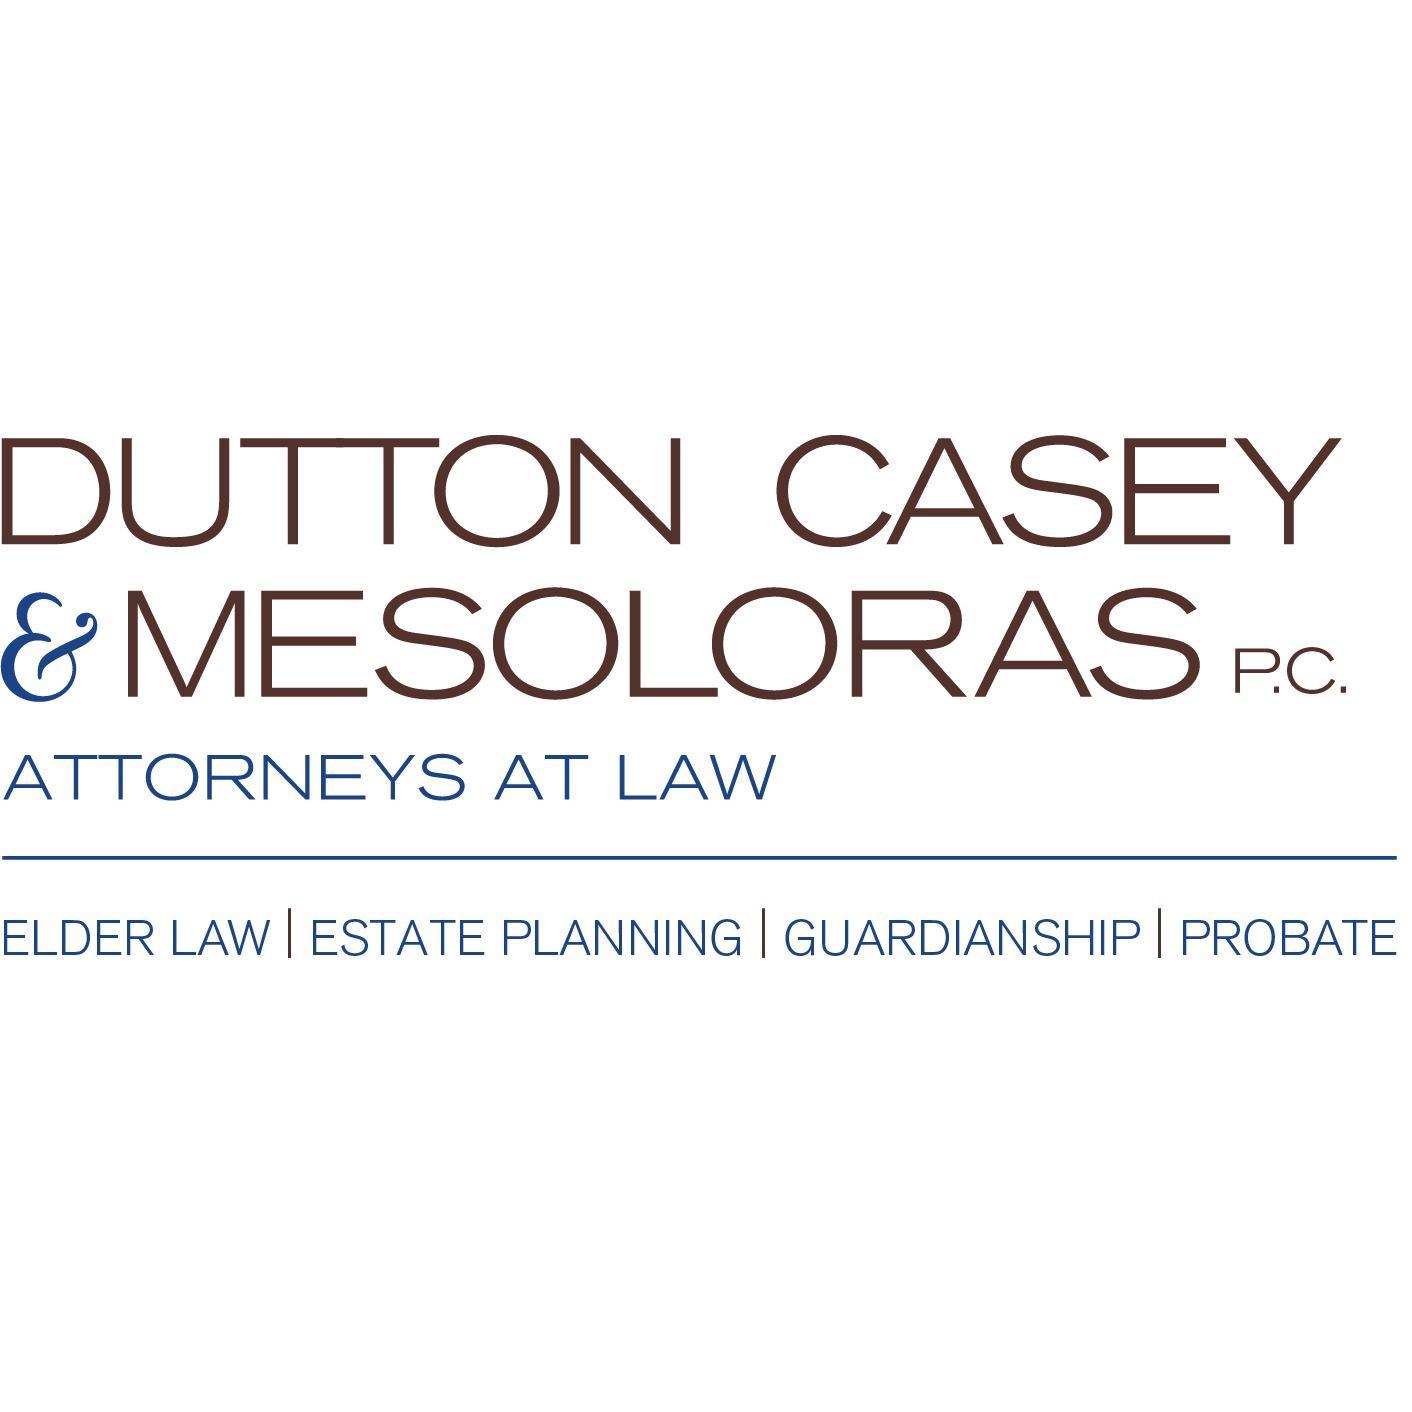 photo of Dutton Casey & Mesoloras, Attorneys at Law (elder law, estate planning, guardianship, probate)